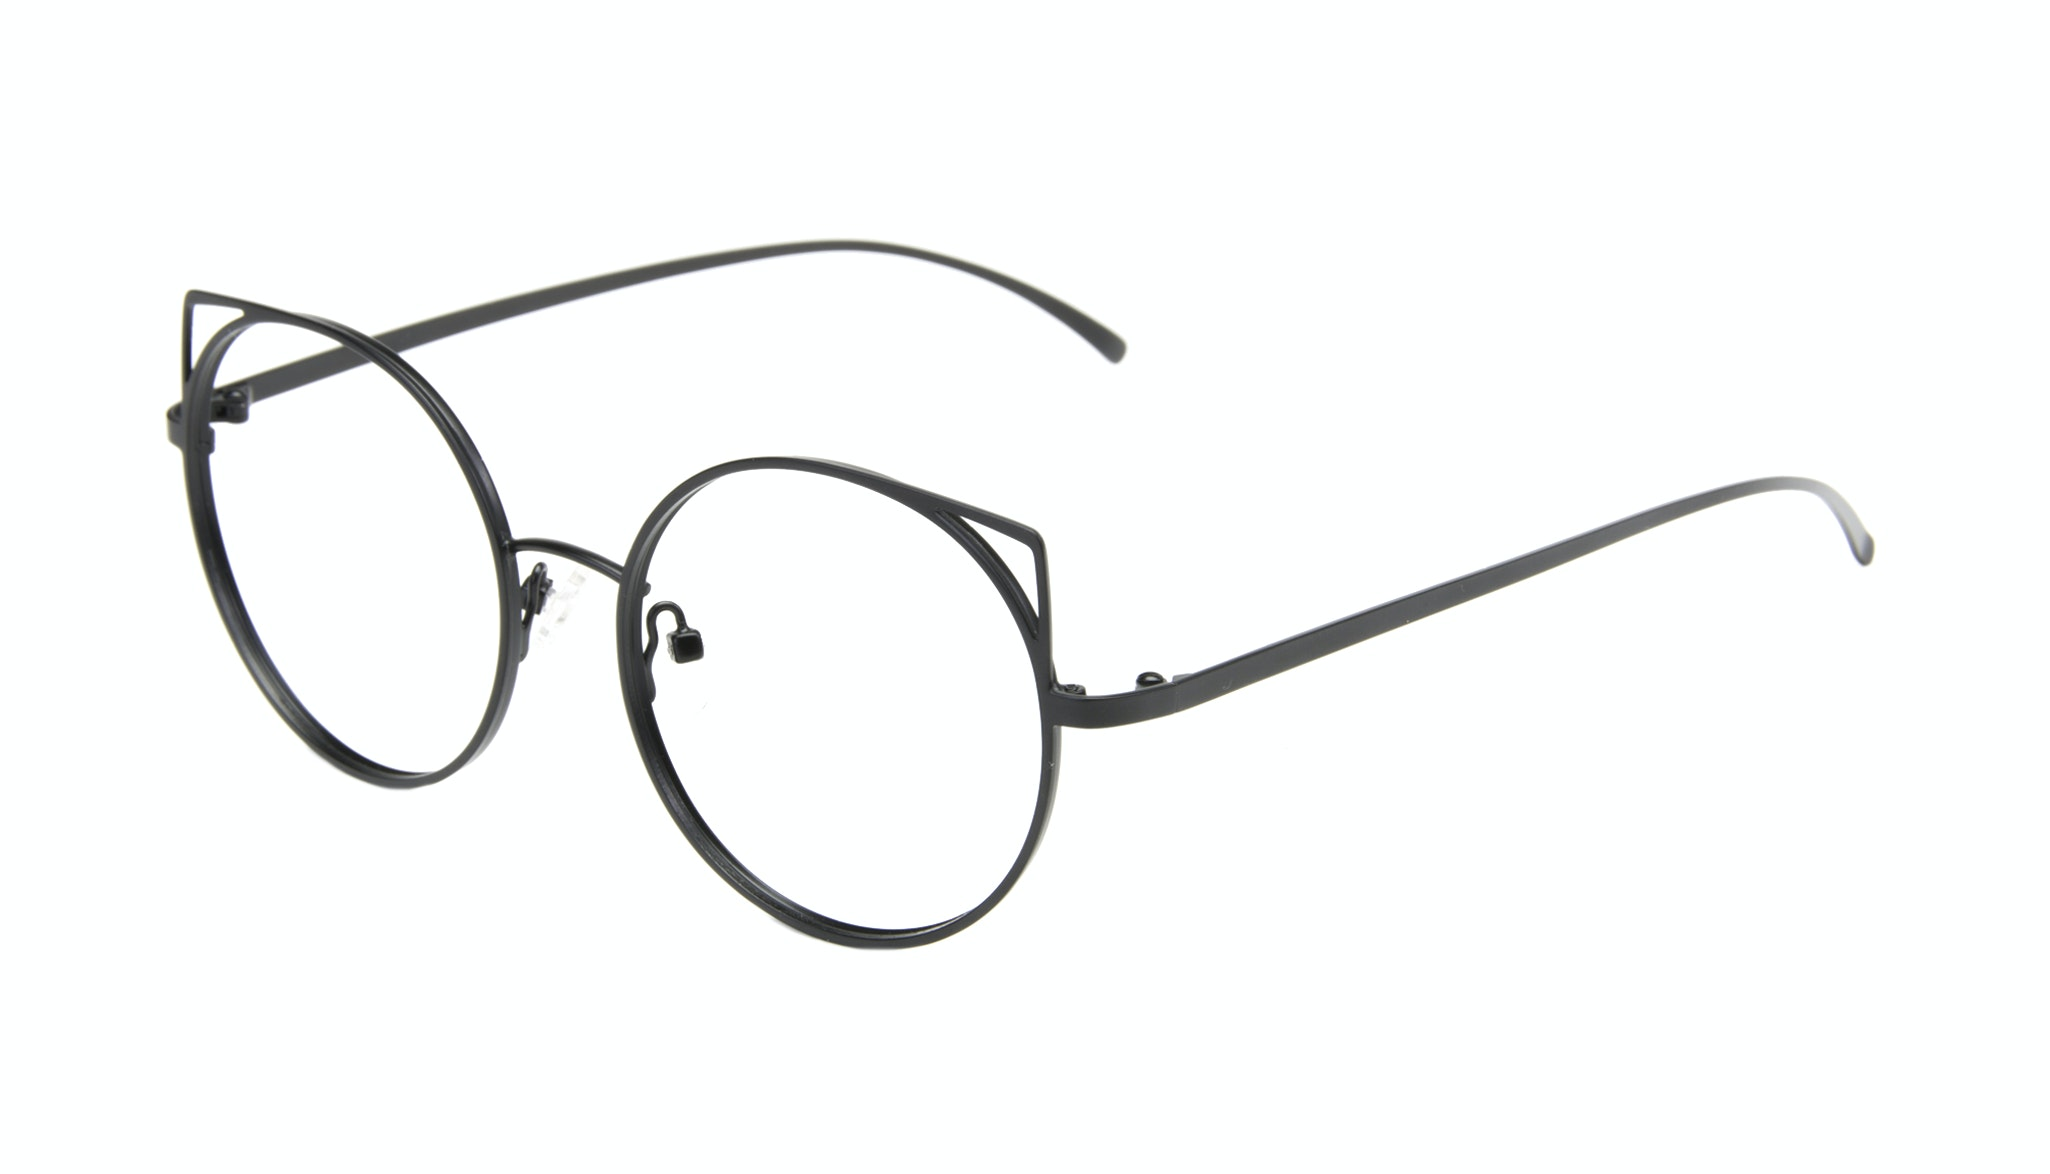 Affordable Fashion Glasses Cat Eye Round Eyeglasses Women Lolly Back To Black Tilt